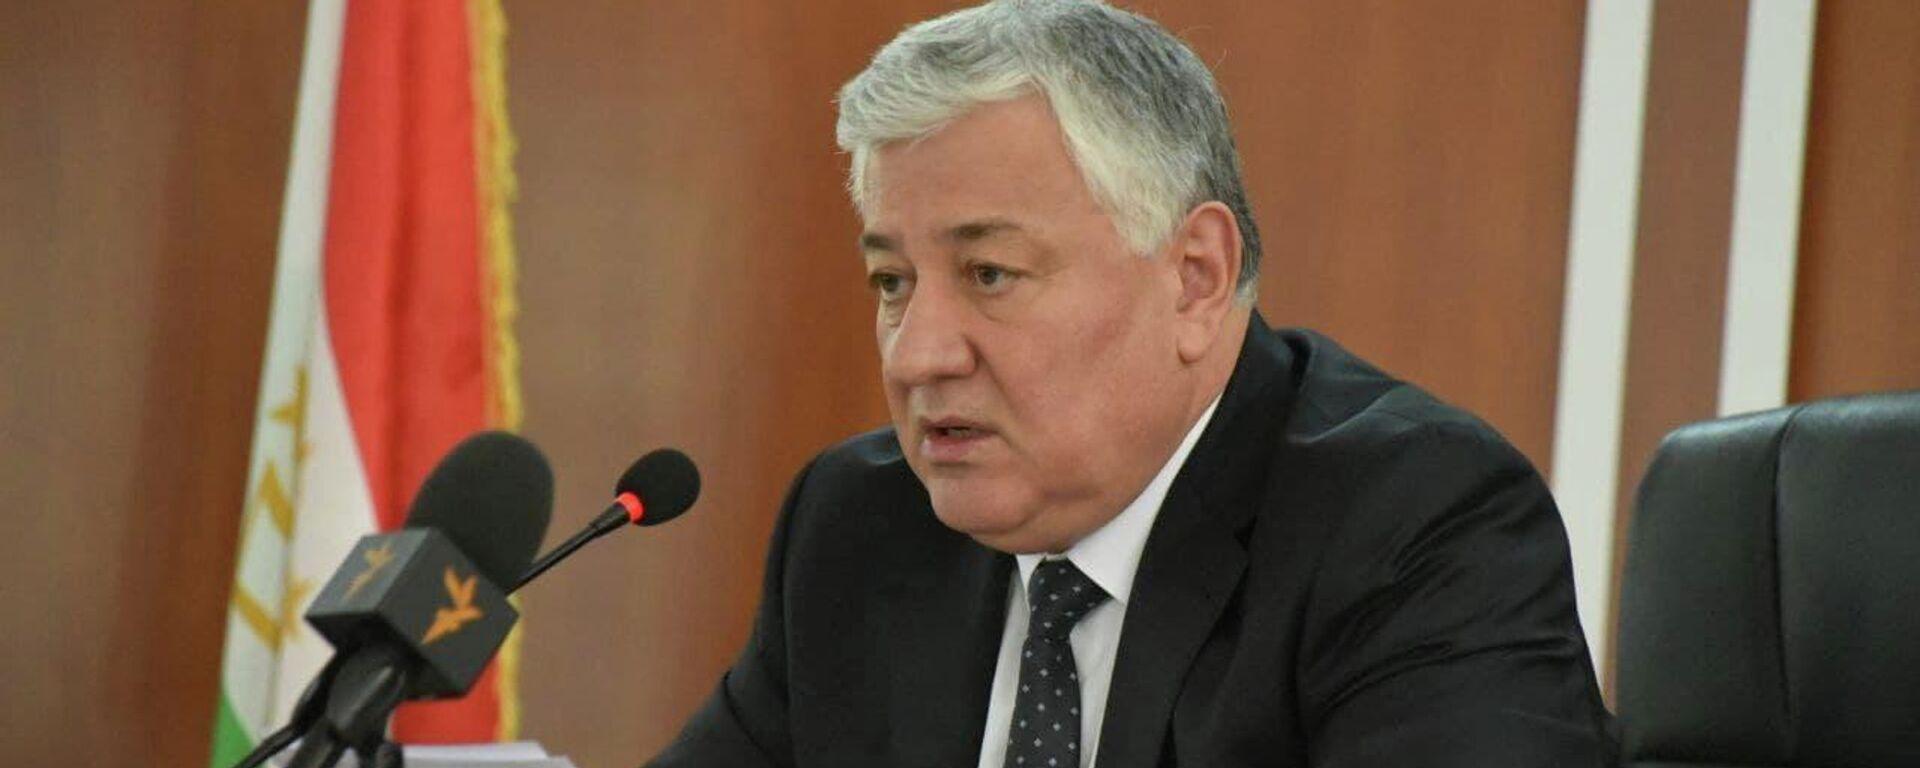 Председатель Верховного суда Шермухаммад Шохиён - Sputnik Таджикистан, 1920, 19.07.2021